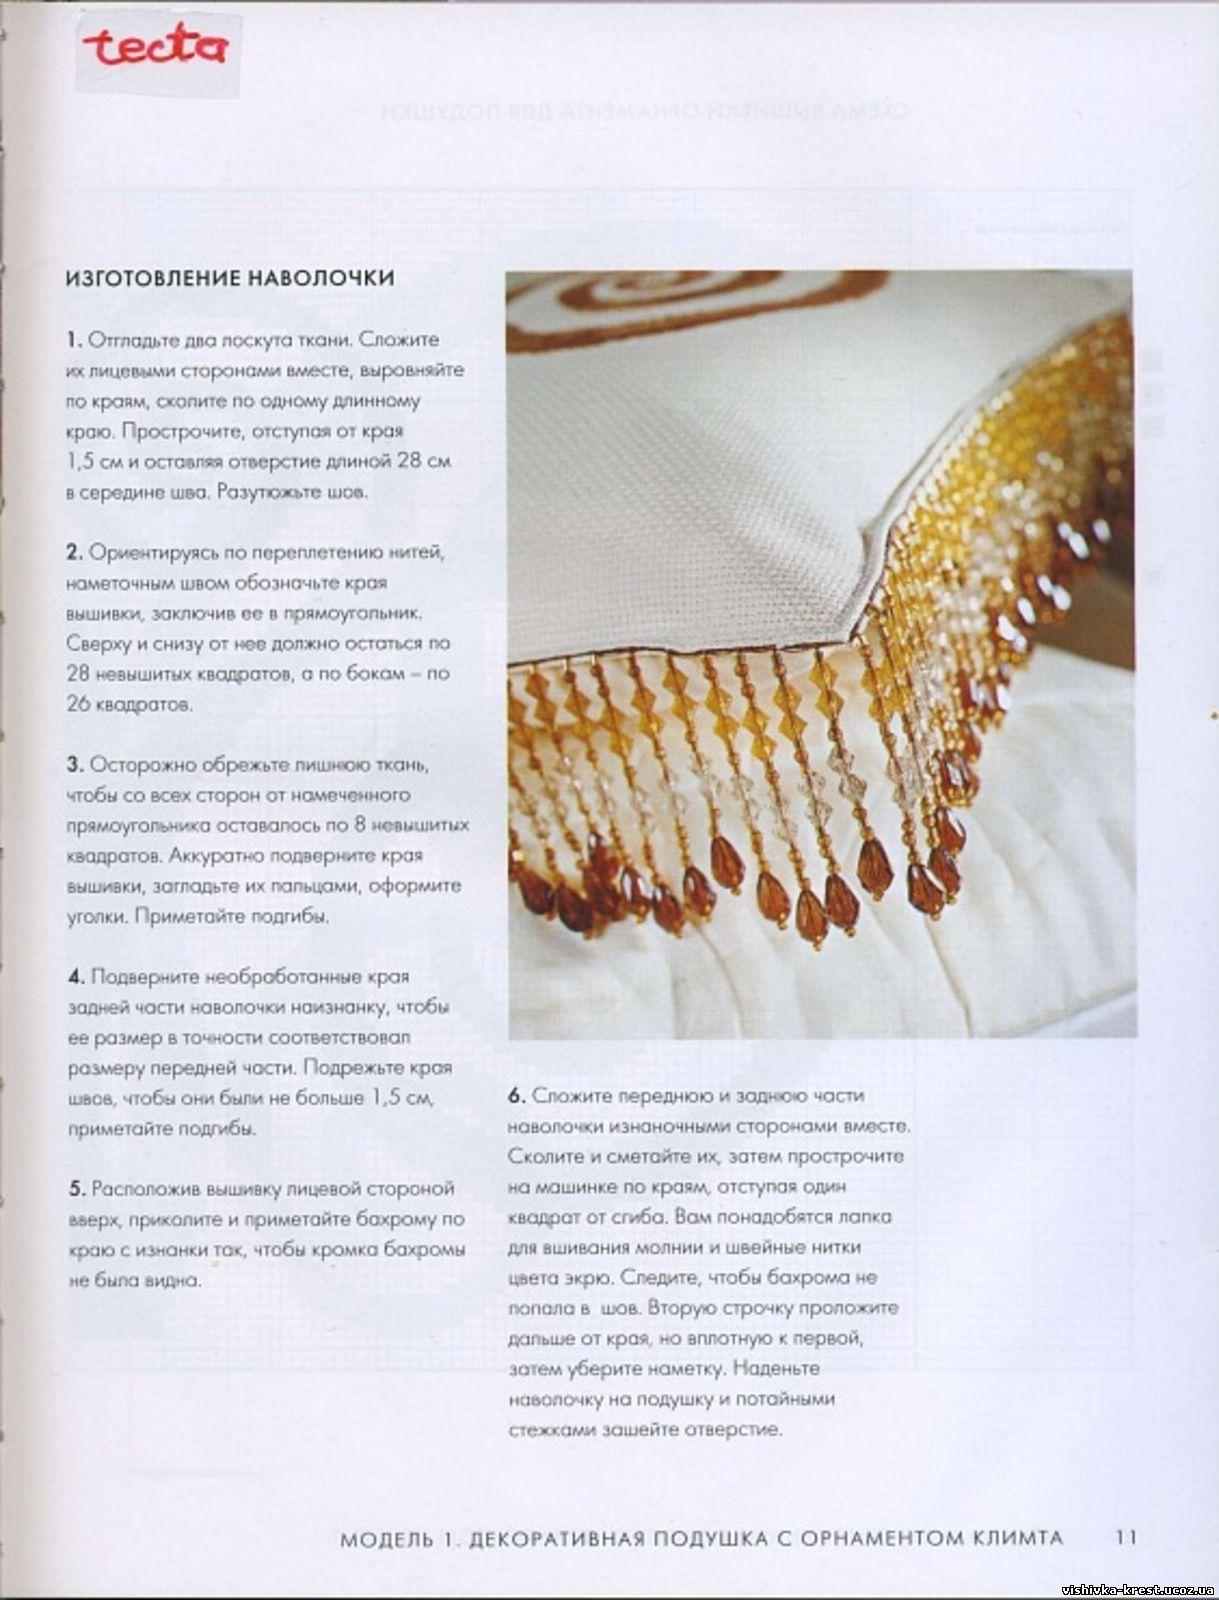 Вышивка вышивка подушки абстракция